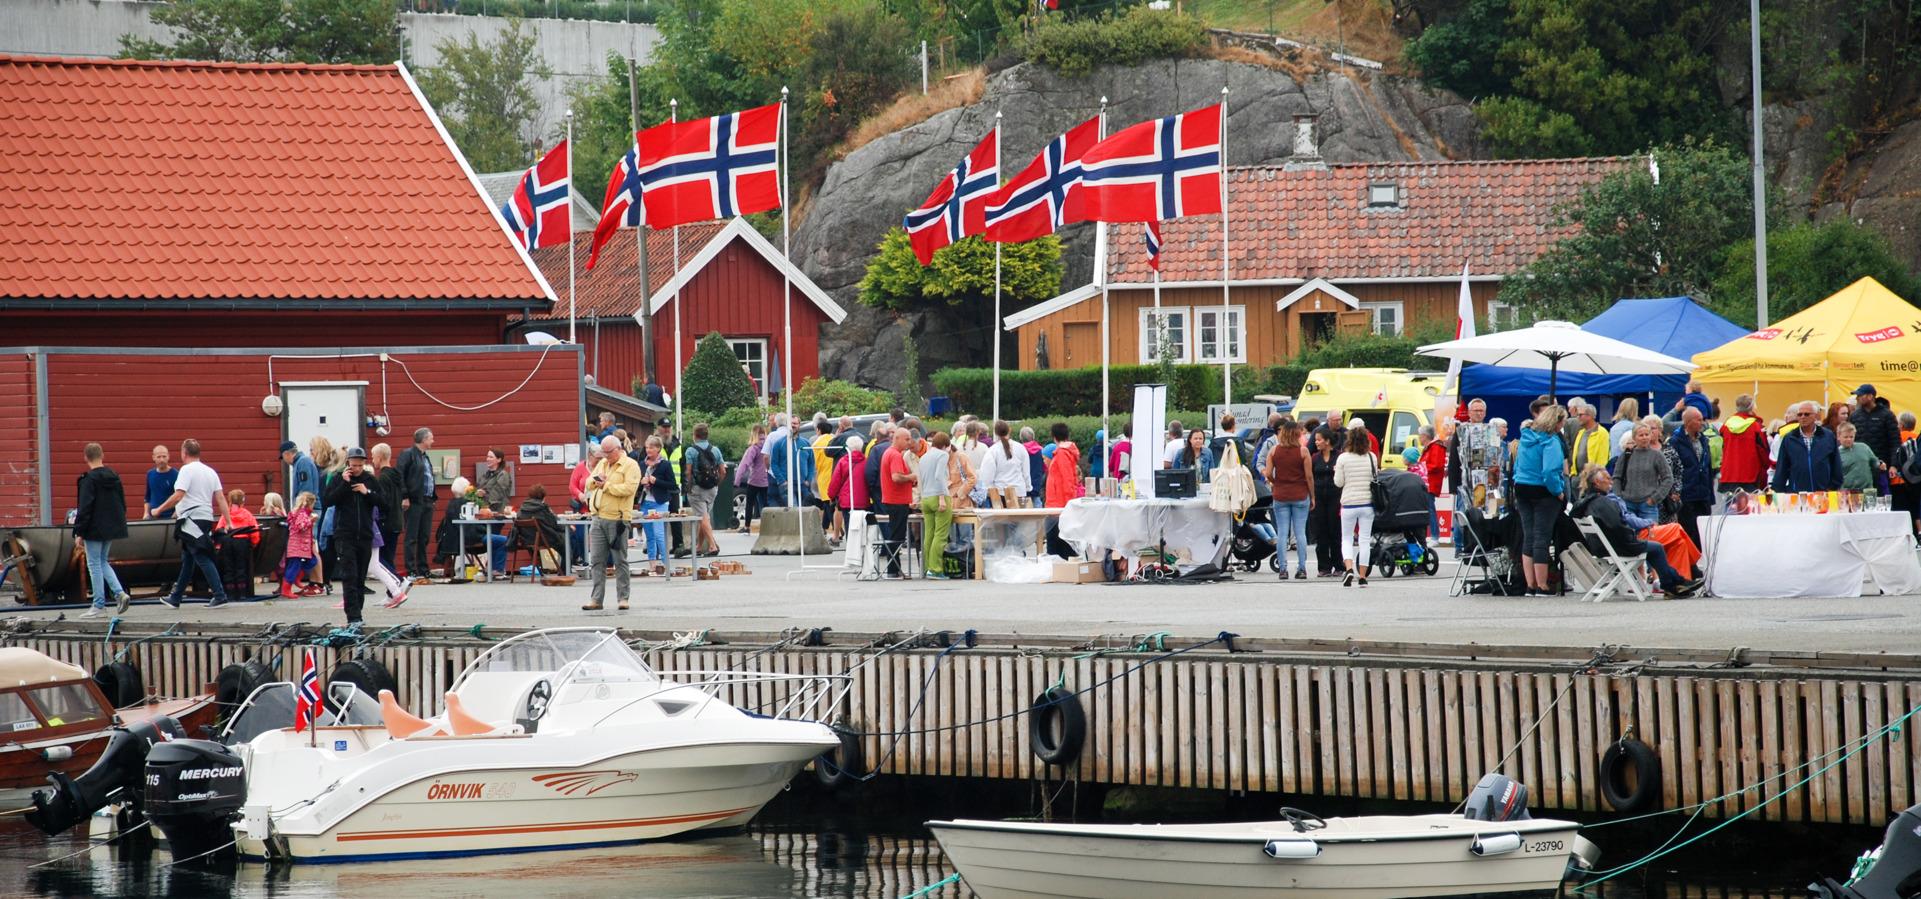 Tall Ships Races 2018 Hå historielag (42).jpg